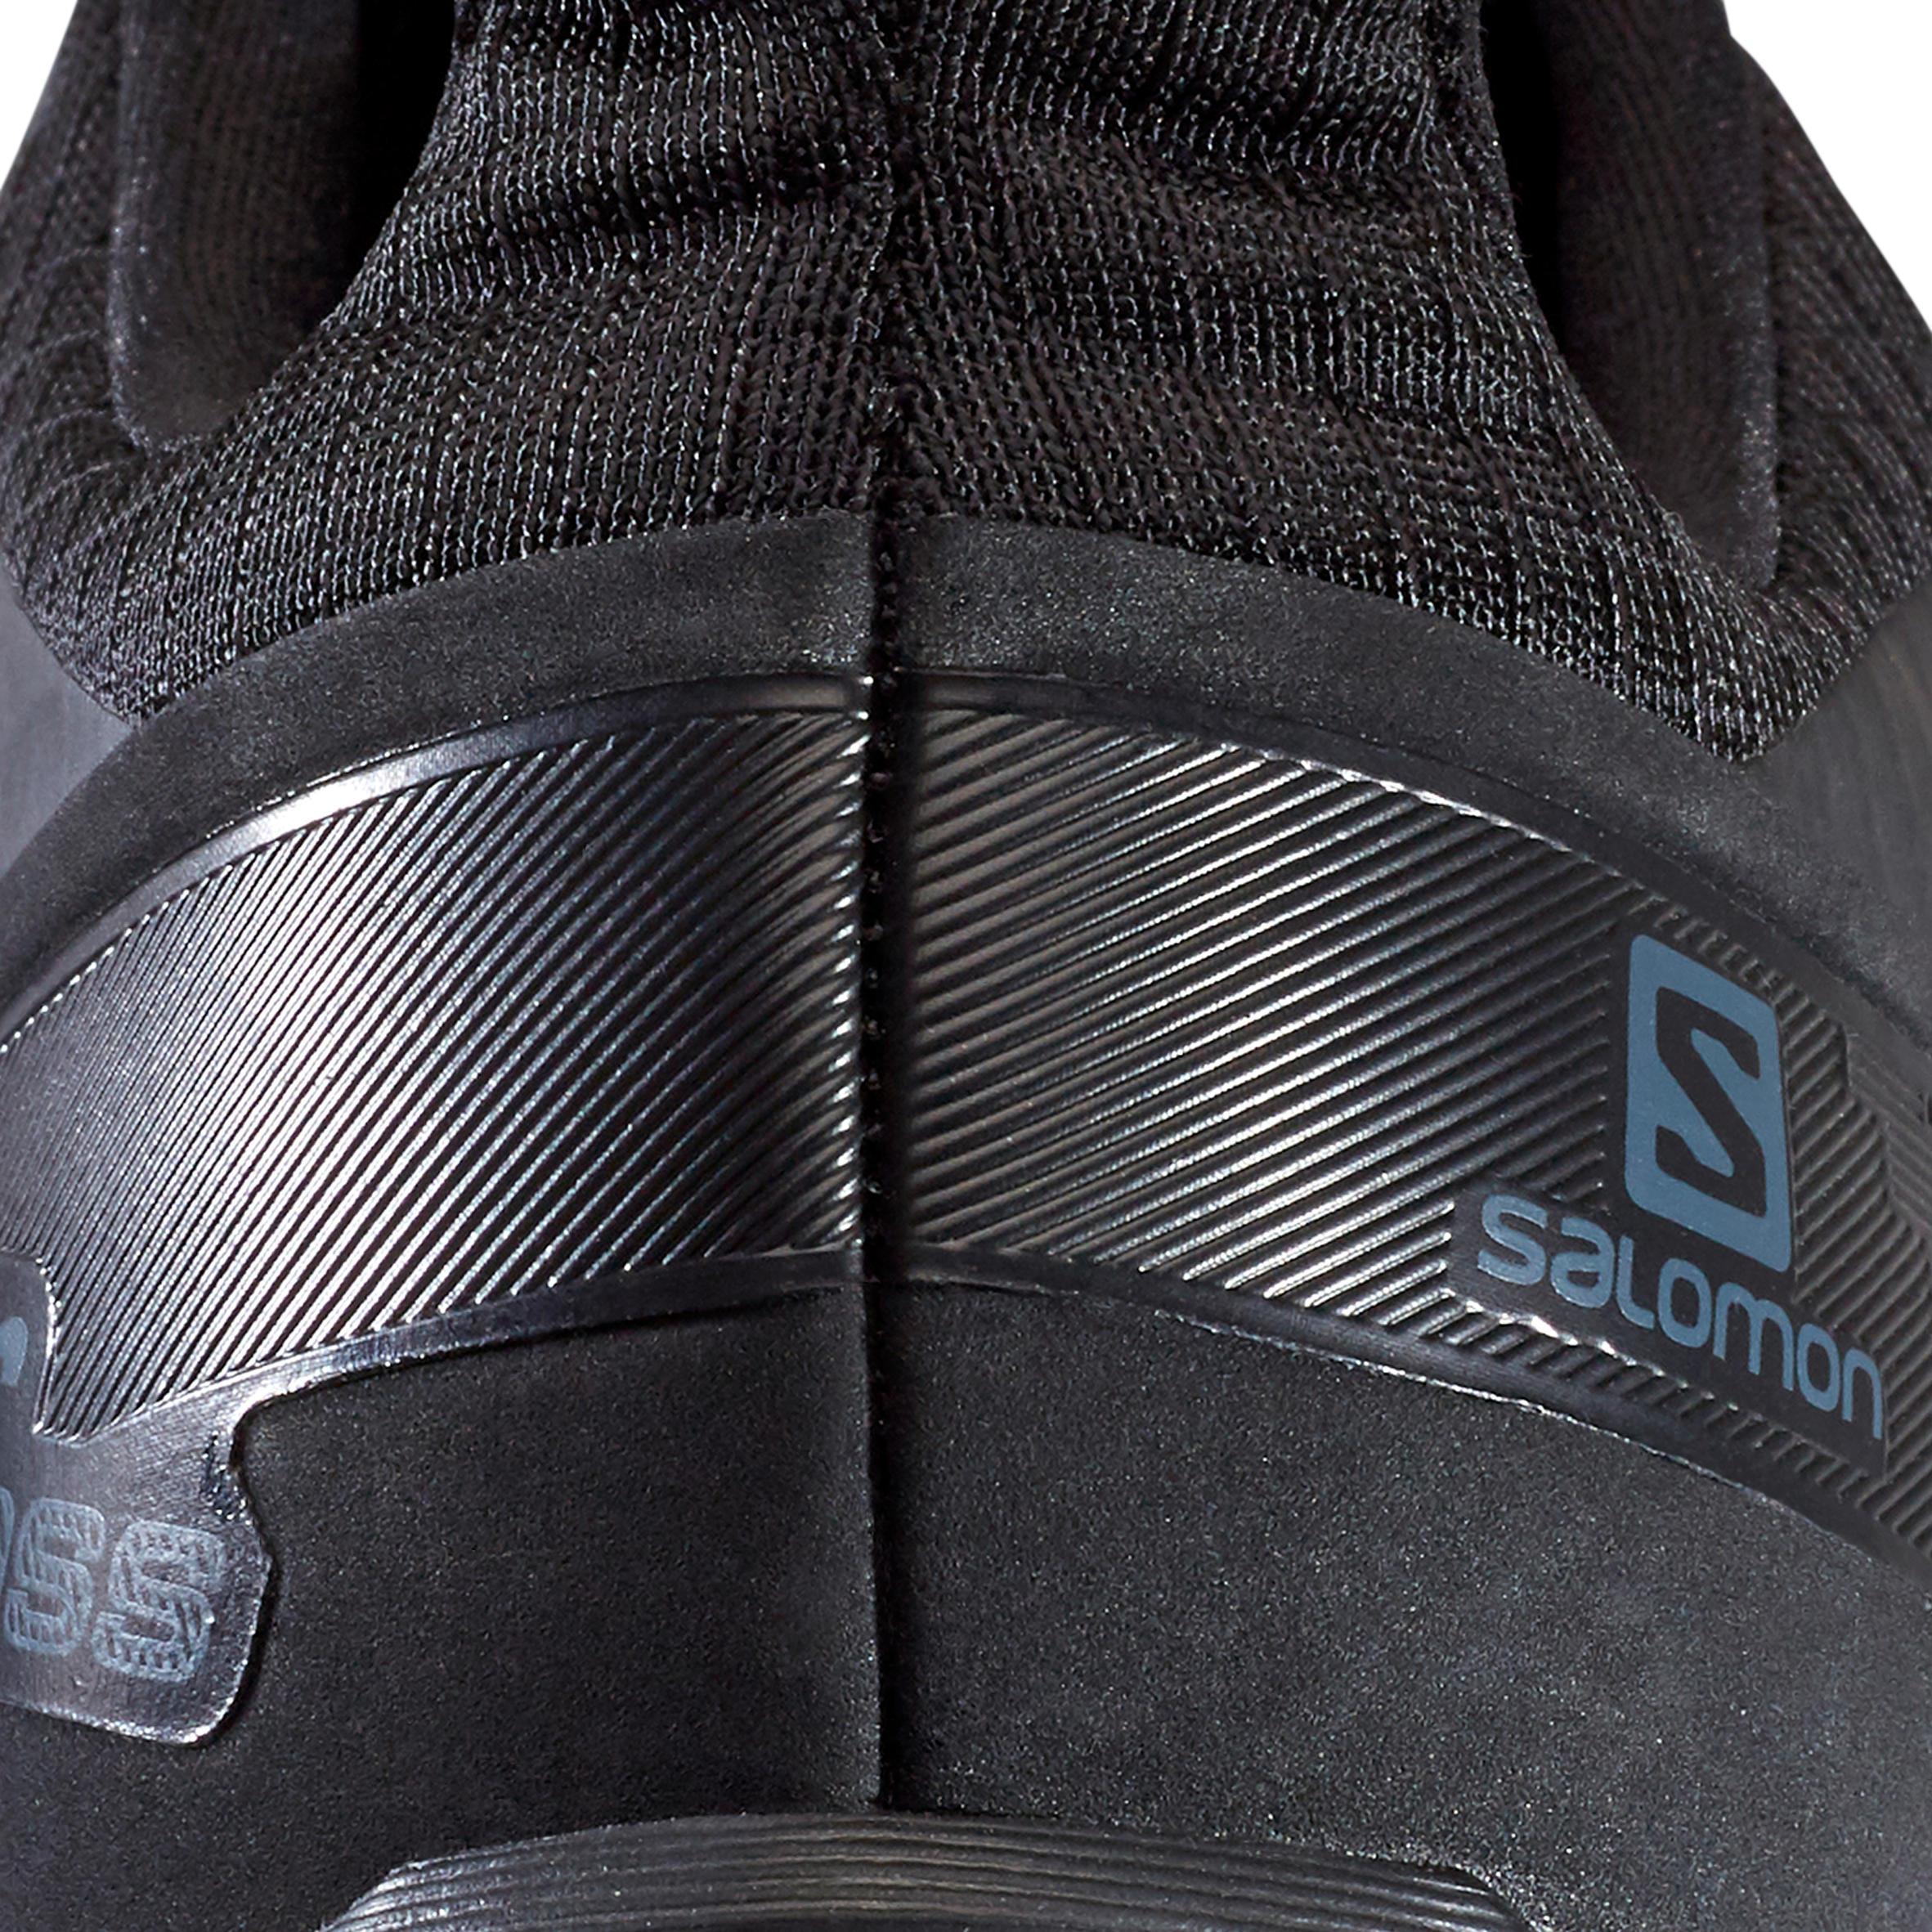 salomon trail running shoes warranty turkey